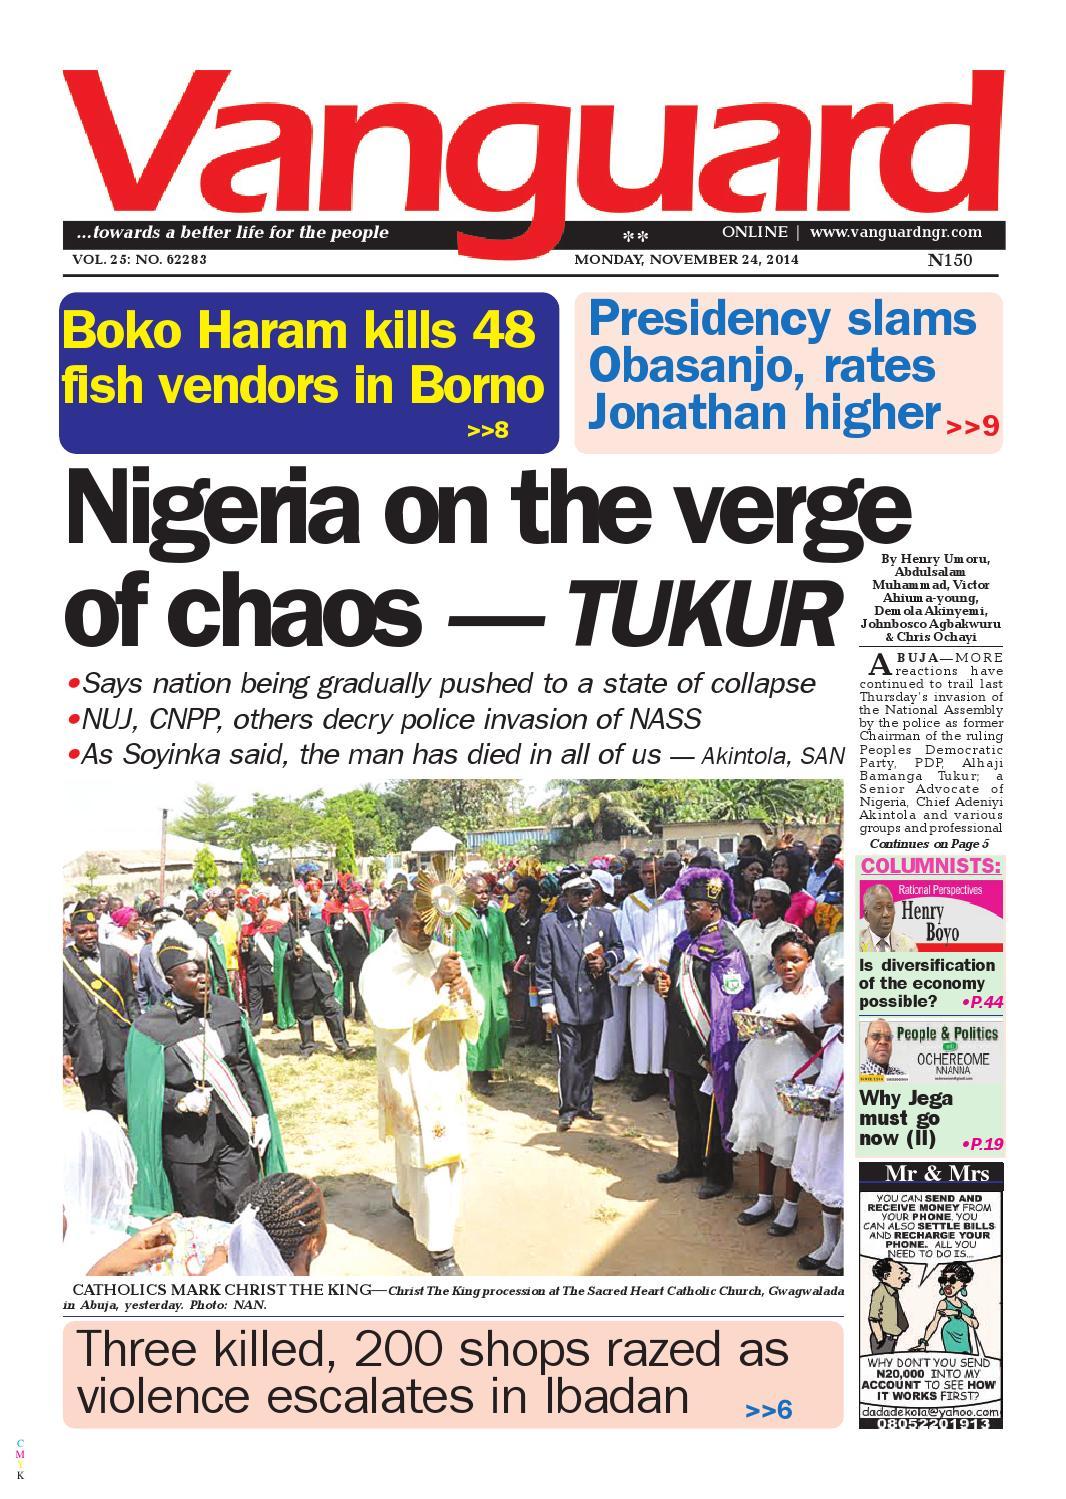 Nigeria on the verge of chaos tukur by Vanguard Media